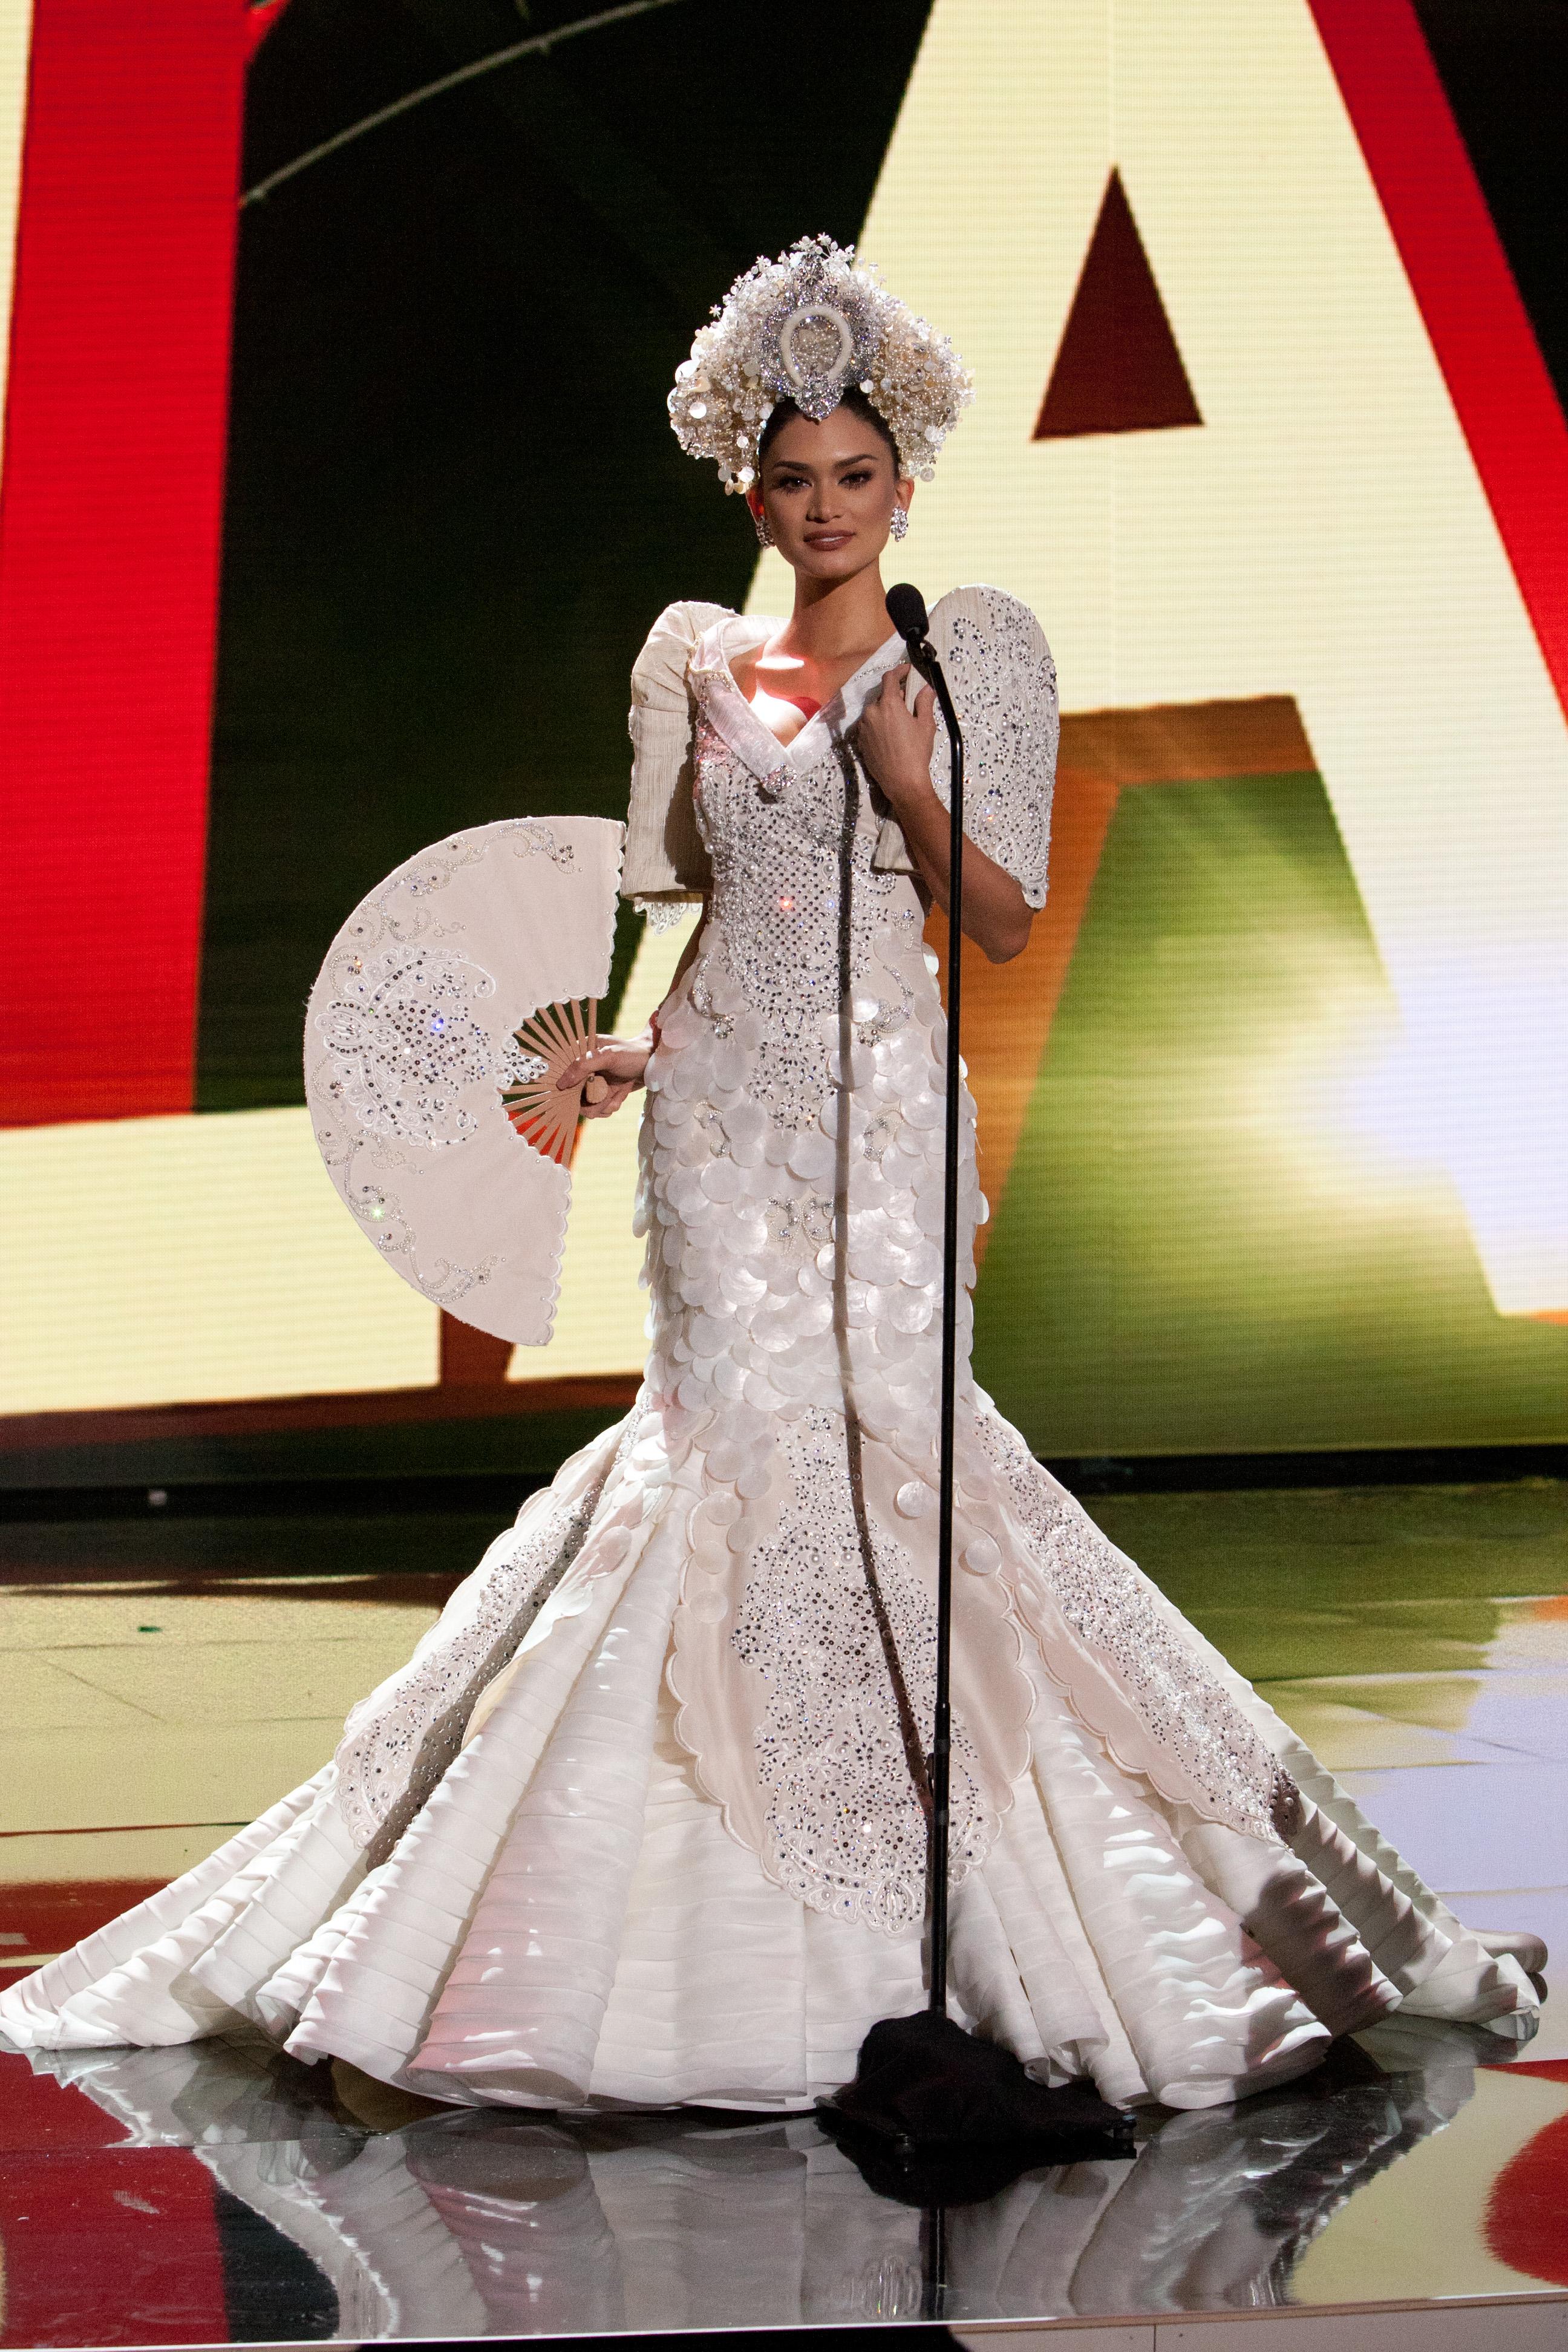 Look Miss Universe Ph 2015 Pia Wurtzbach 39 S National Costume